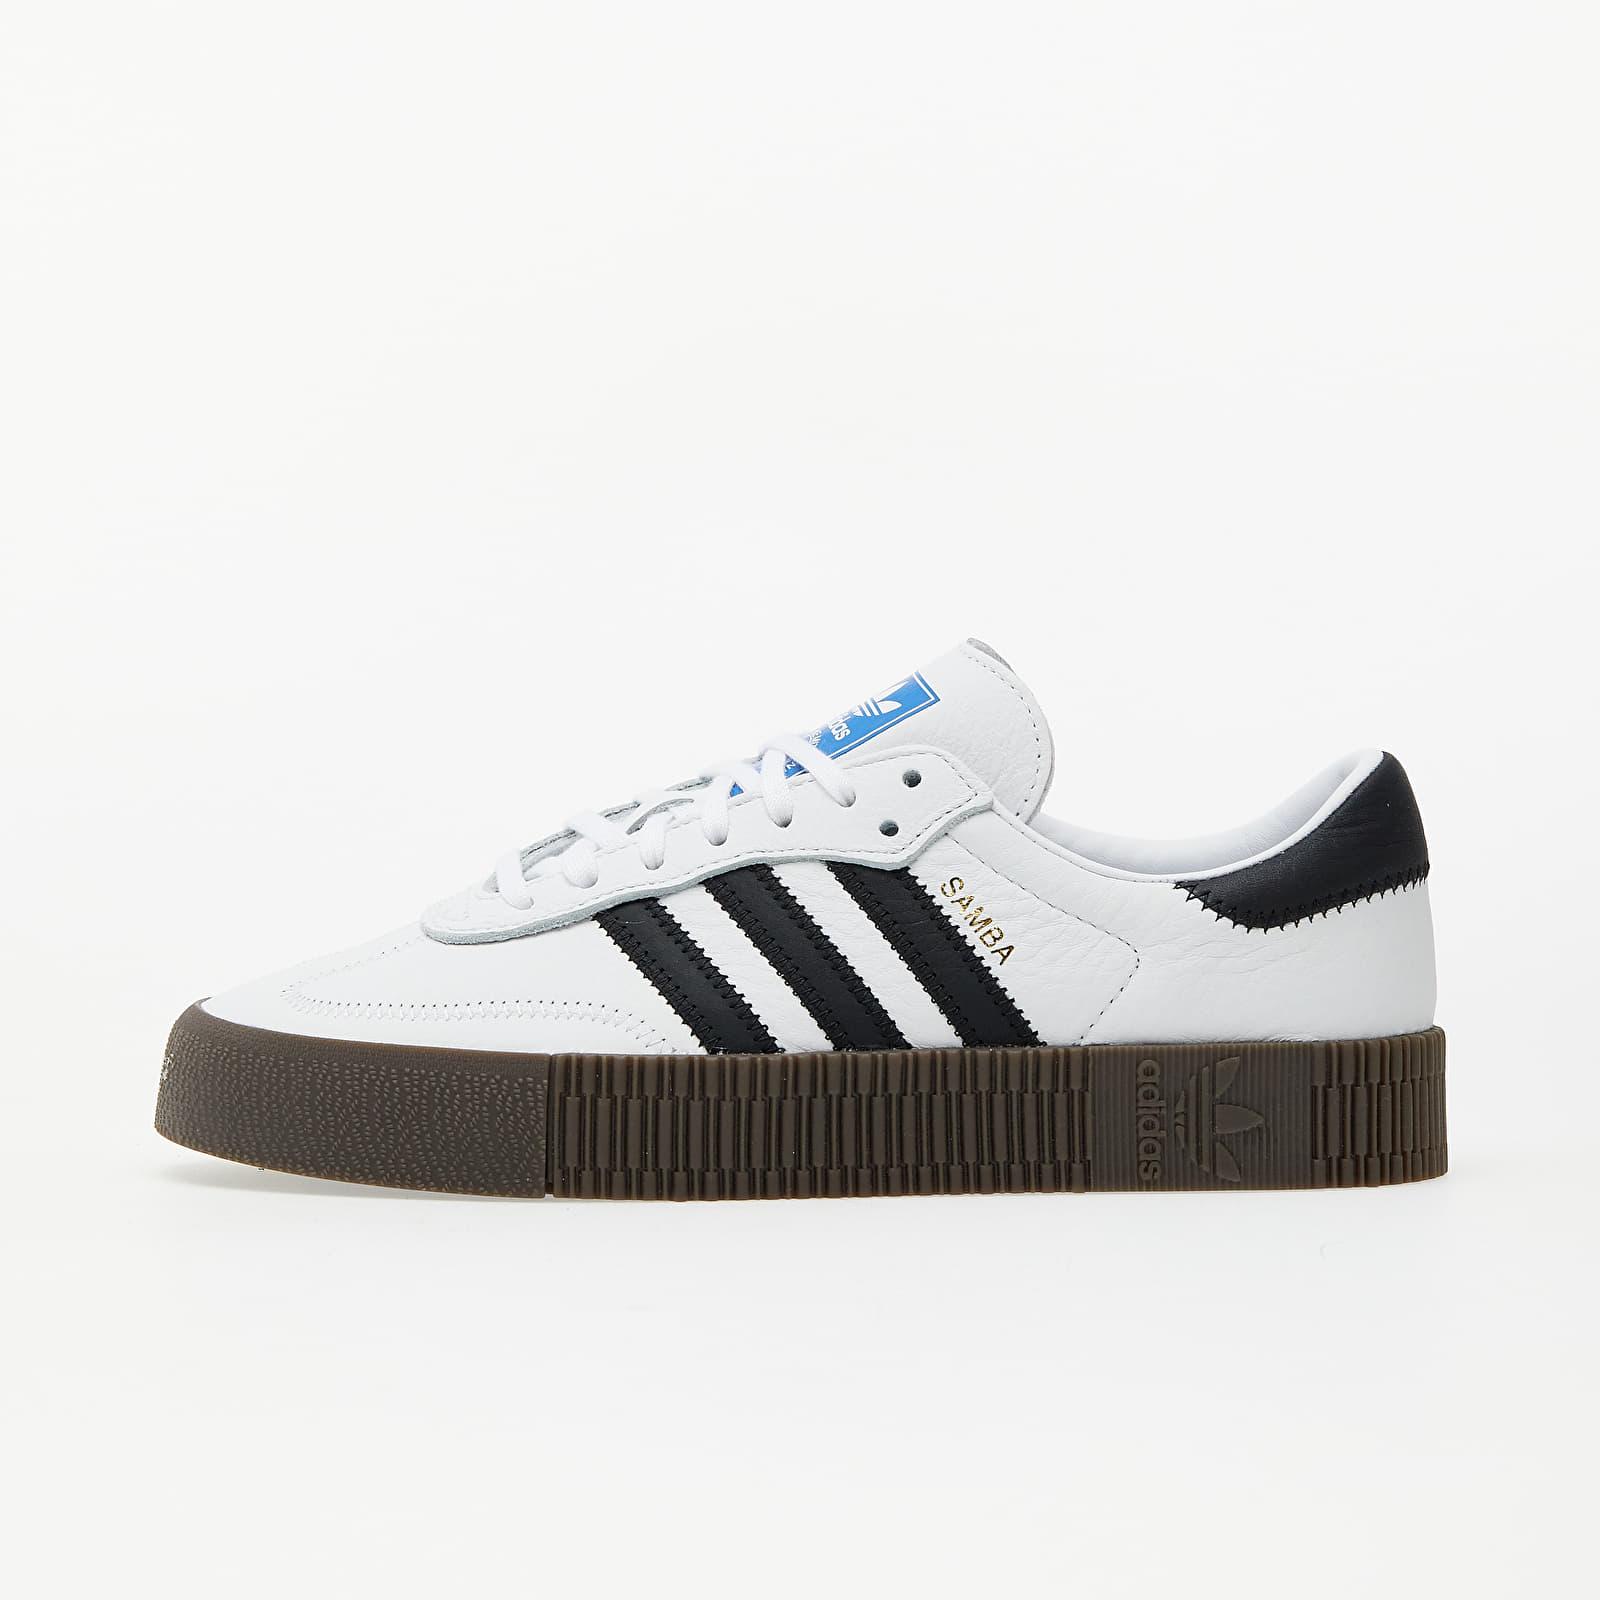 Women's shoes adidas Sambarose W Ftw White/ Core Black/ Gum5